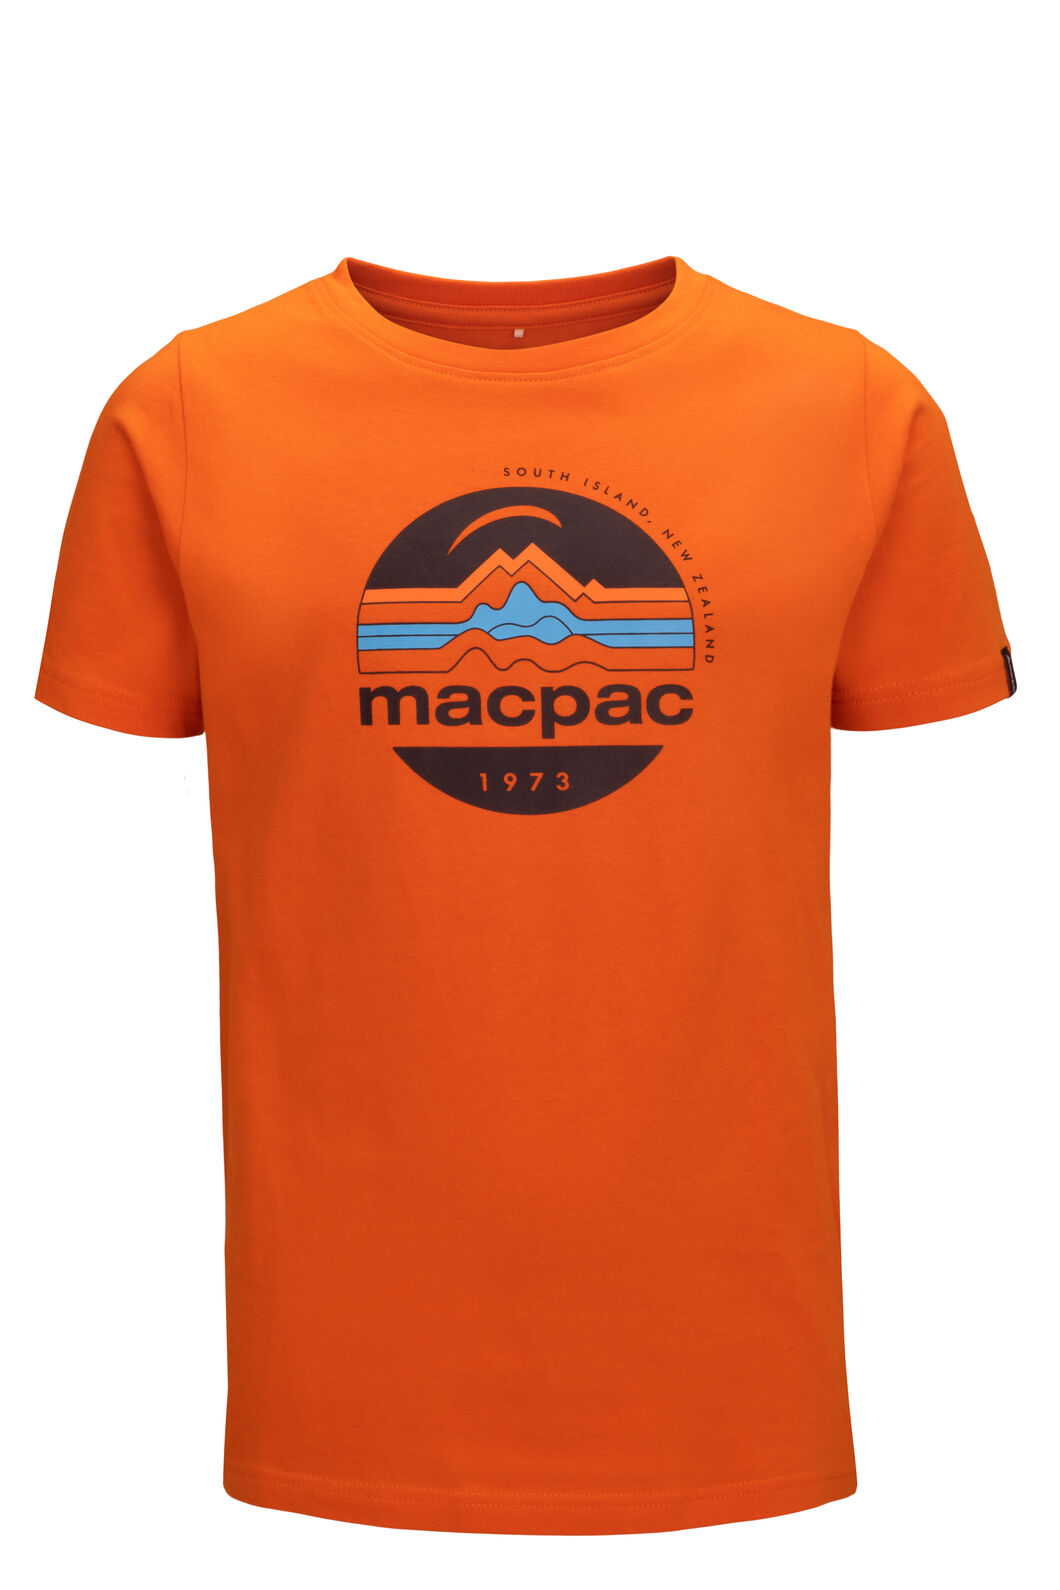 Macpac Kids' Retro Fairtrade Organic Cotton Tee, Russet Orange, hi-res